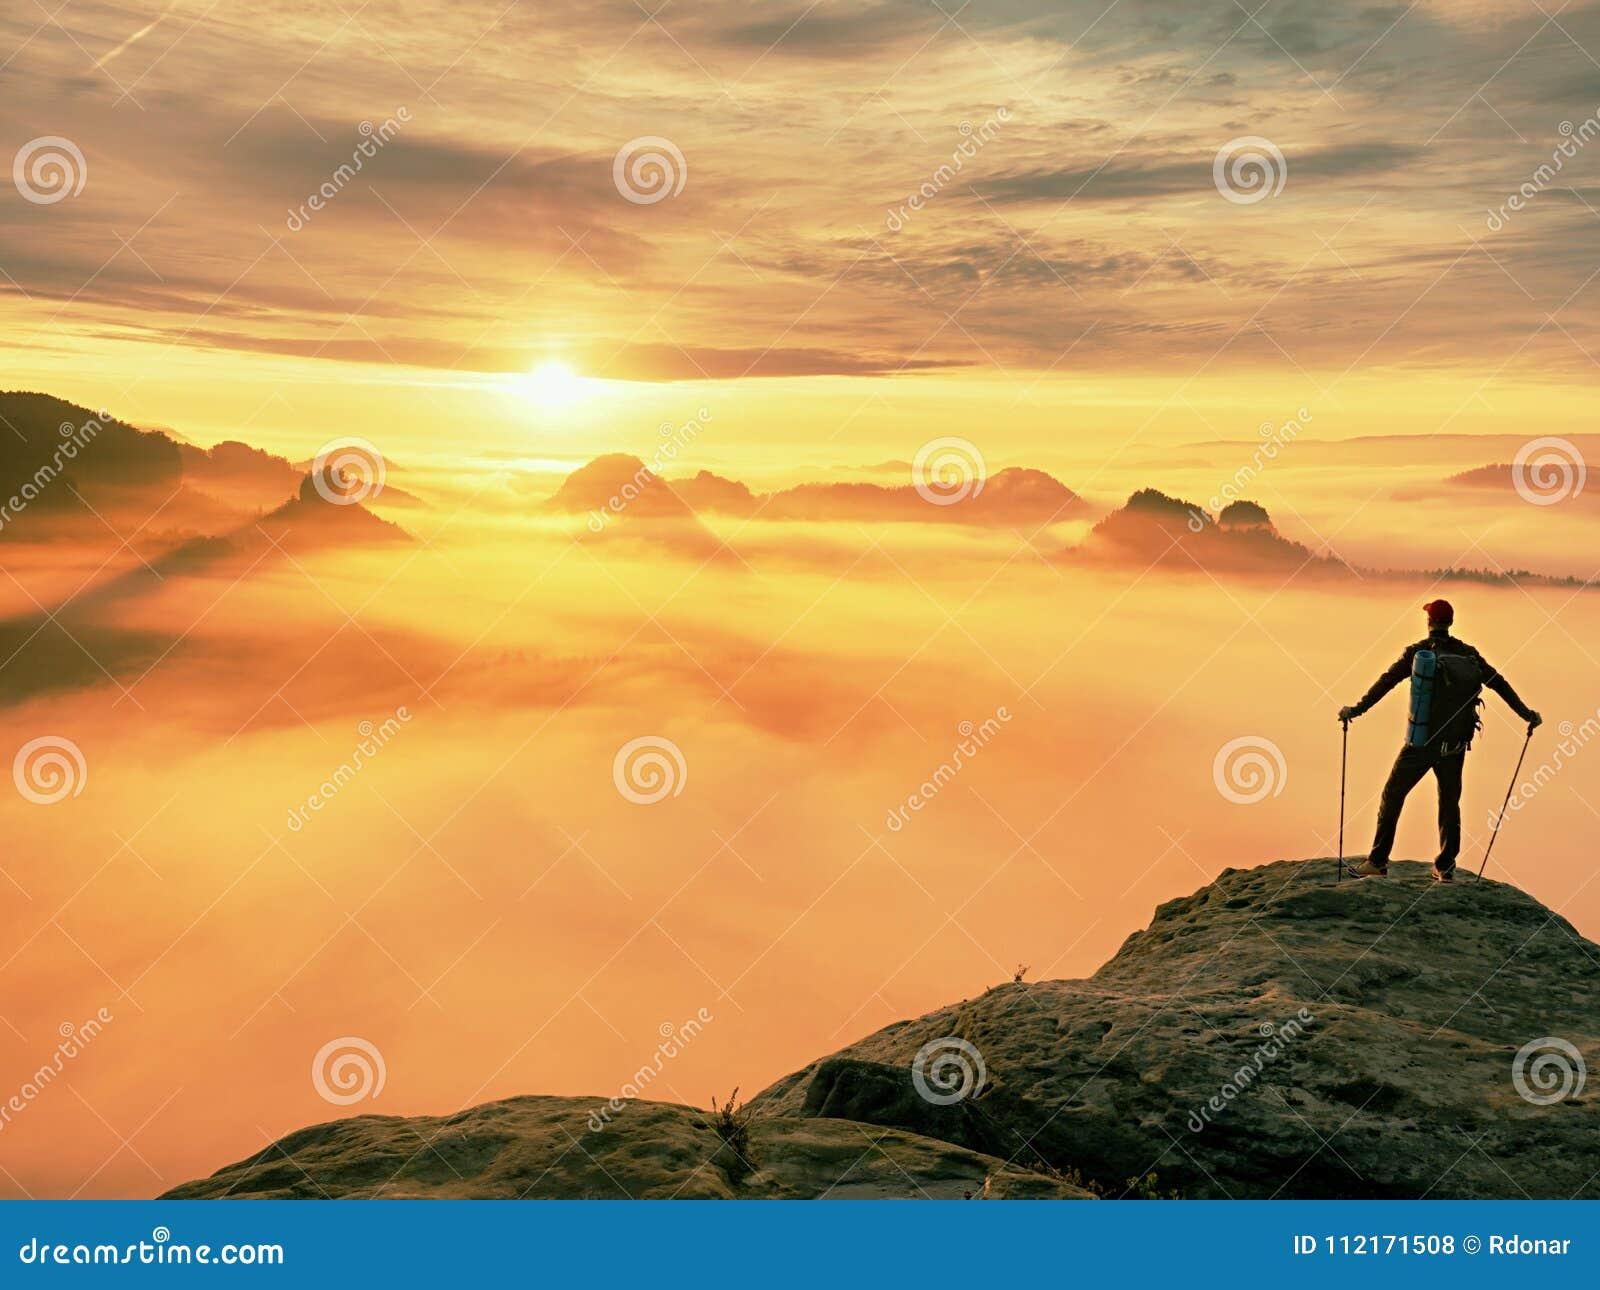 Man silhouette stay on sharp rock peak. Satisfy hiker enjoy view. Tall man on rocky cliff